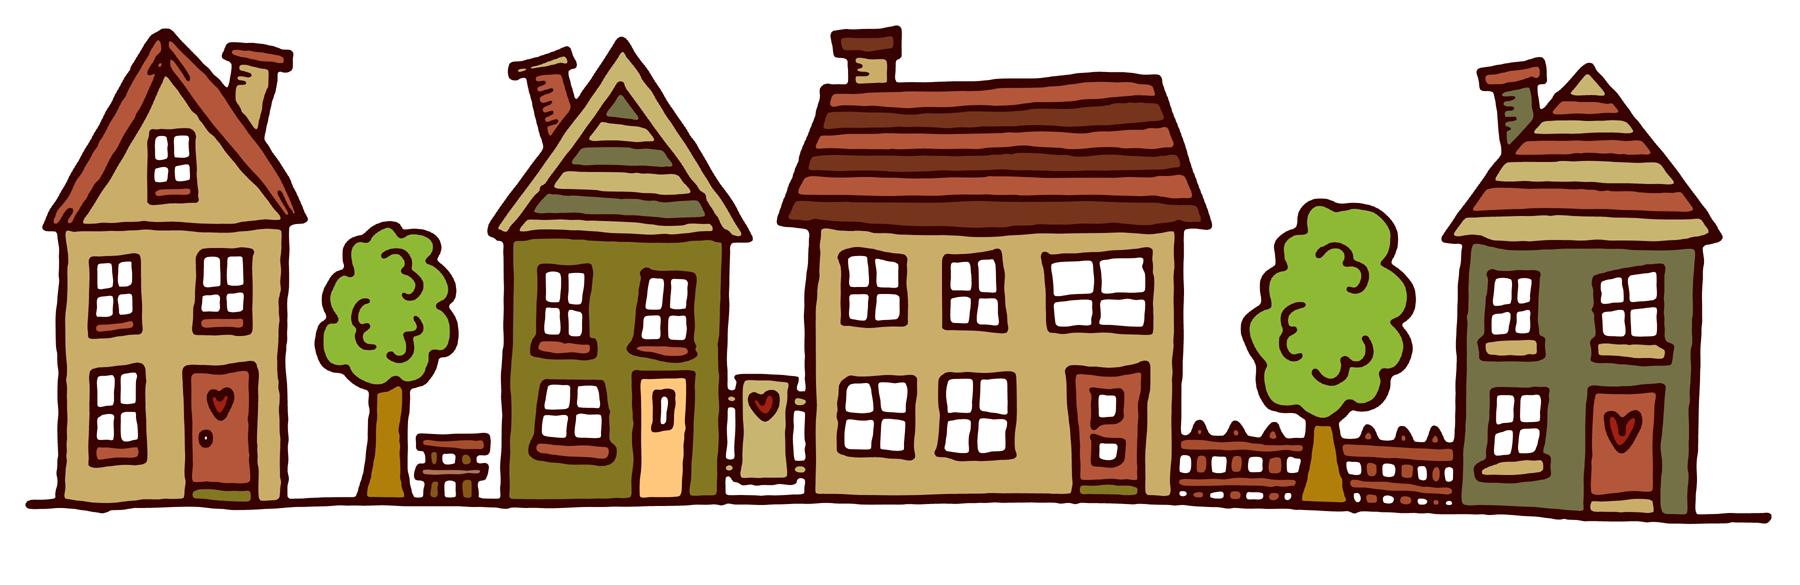 free clip art photos of homes - photo #47